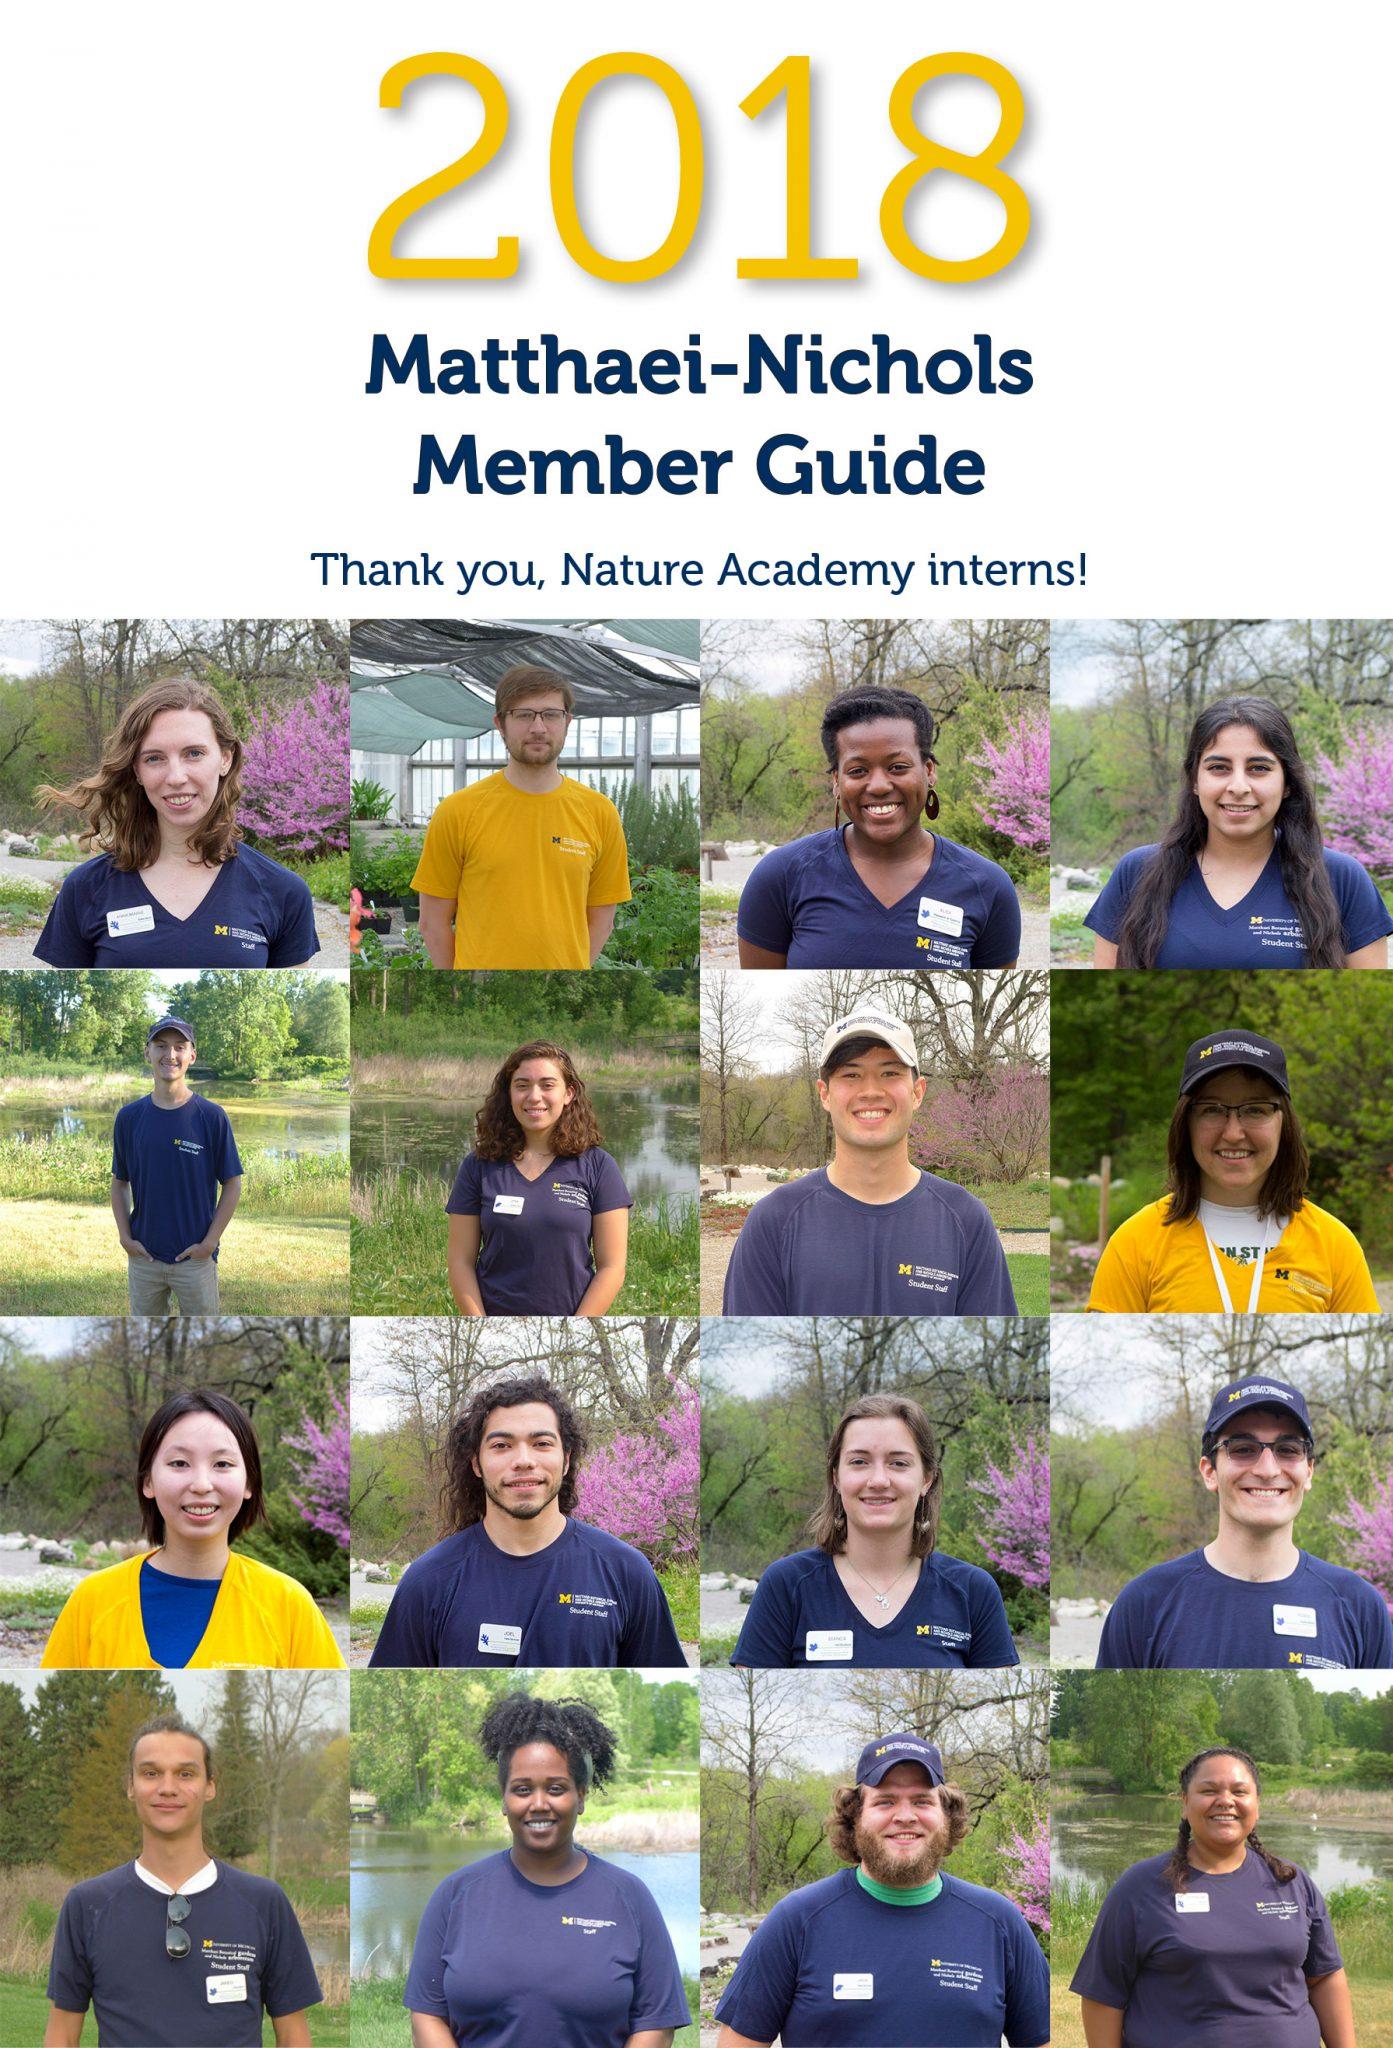 2018 Matthaei-Nichols member guide